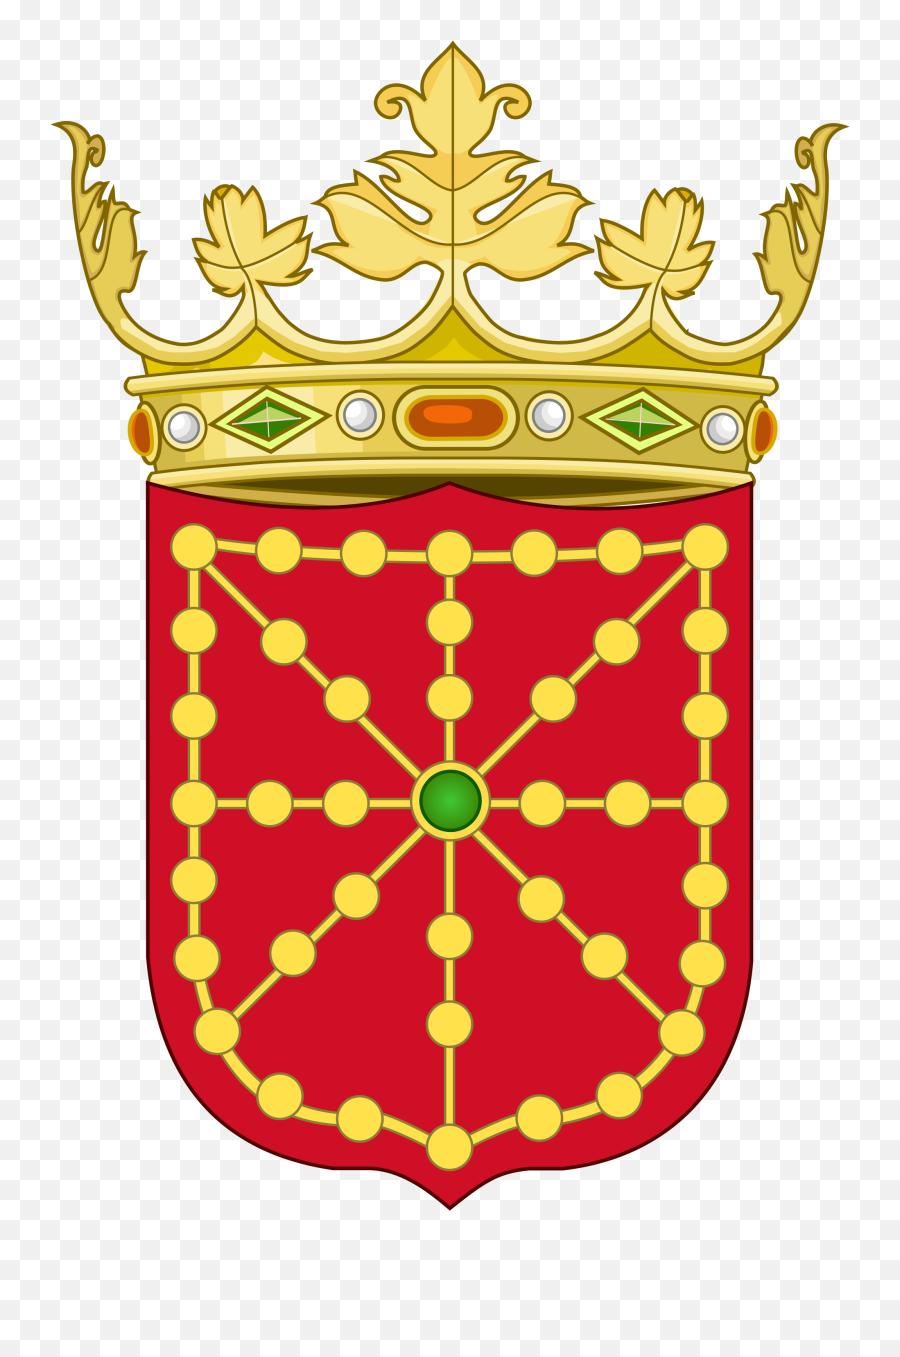 2 - Kingdom Of Navarre Emoji,Crown Emoticon